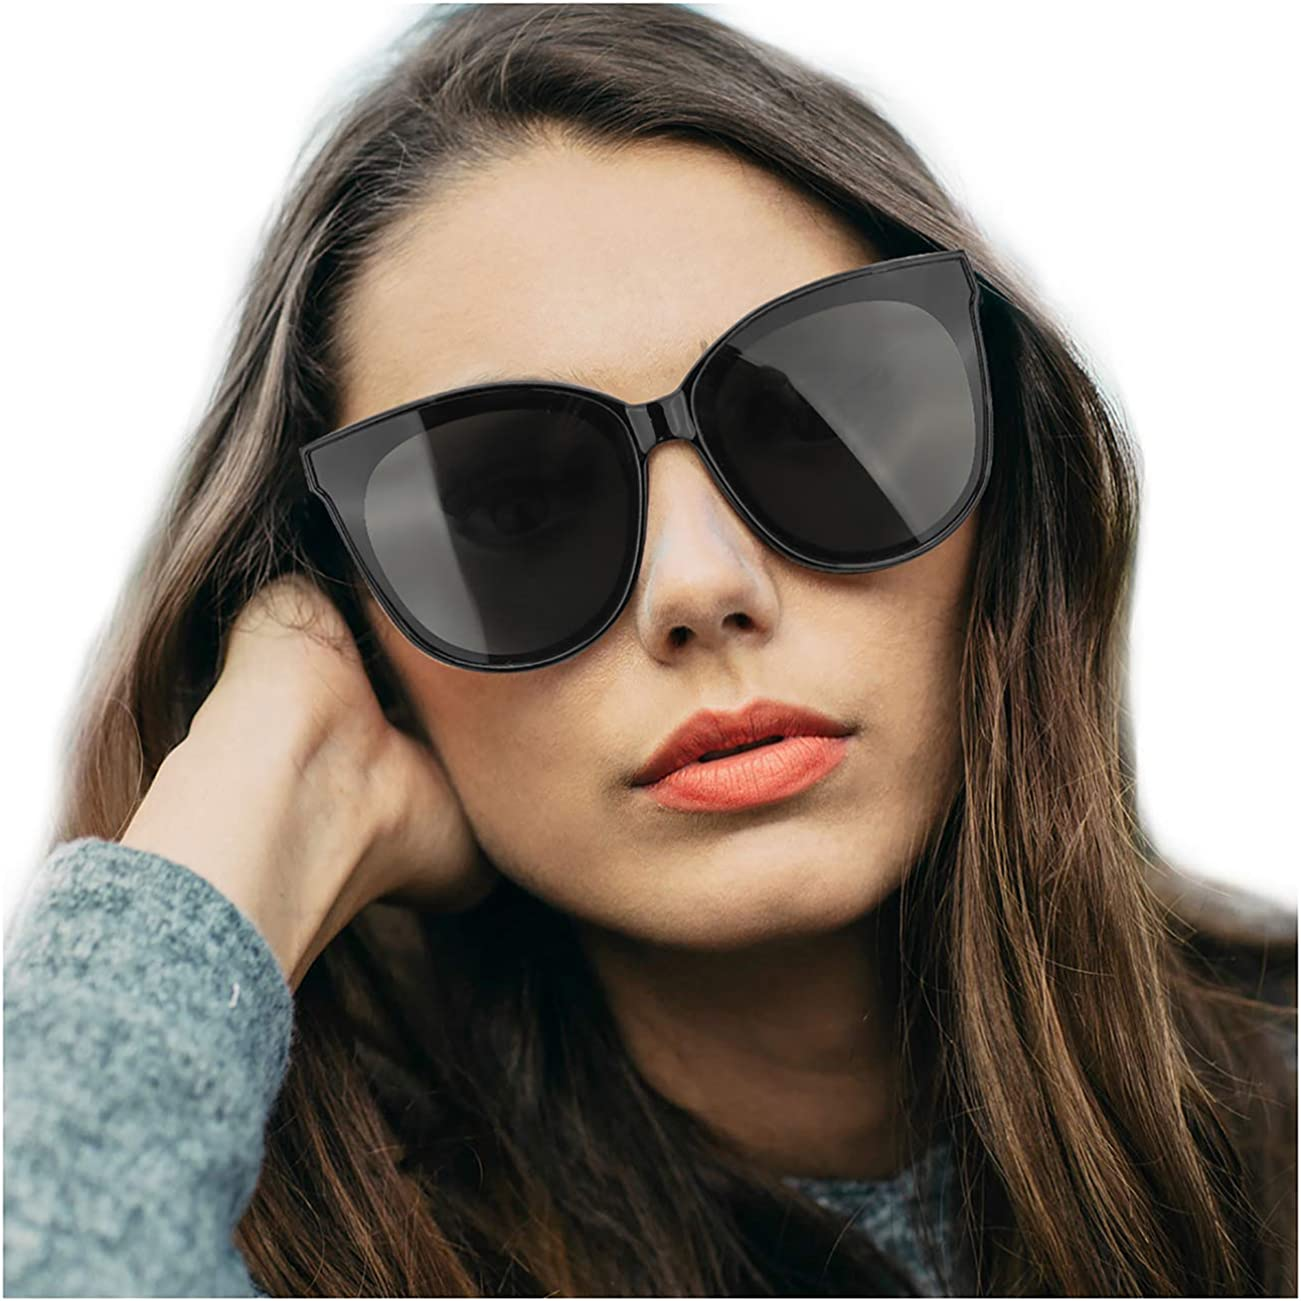 Ladies Womens Oversized Cat Eye Sunglasses Vintage Style Retro Shades Eyew Rs